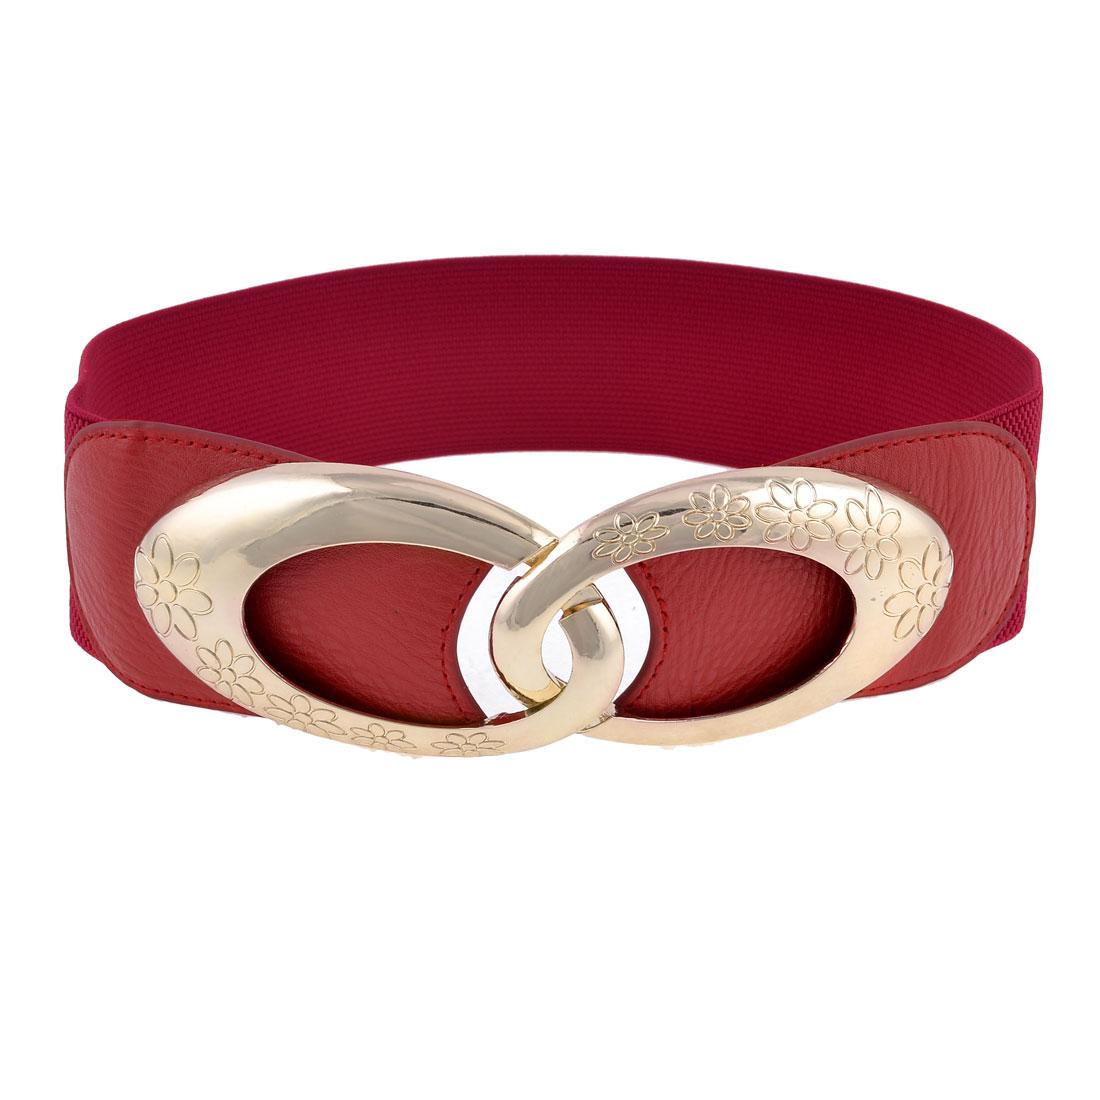 Lady Gold Tone Plastic Interlocking Buckle Red Elastic Waistband Cinch Belt